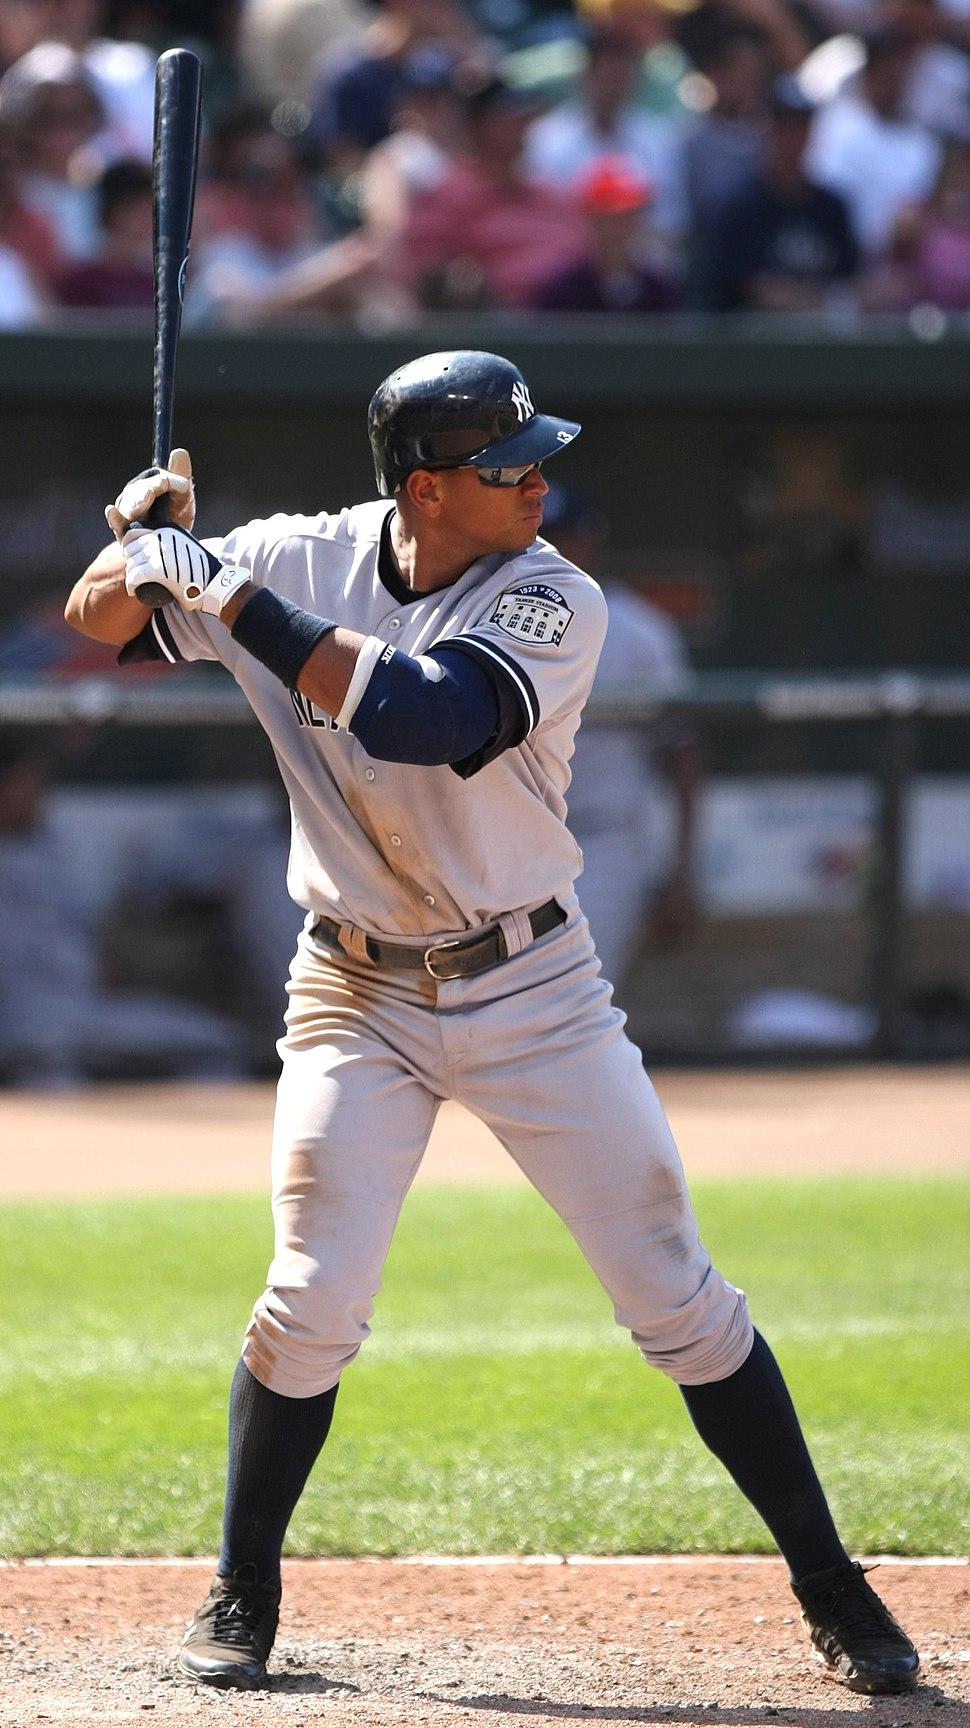 Alex Rodriguez batting stance 2008